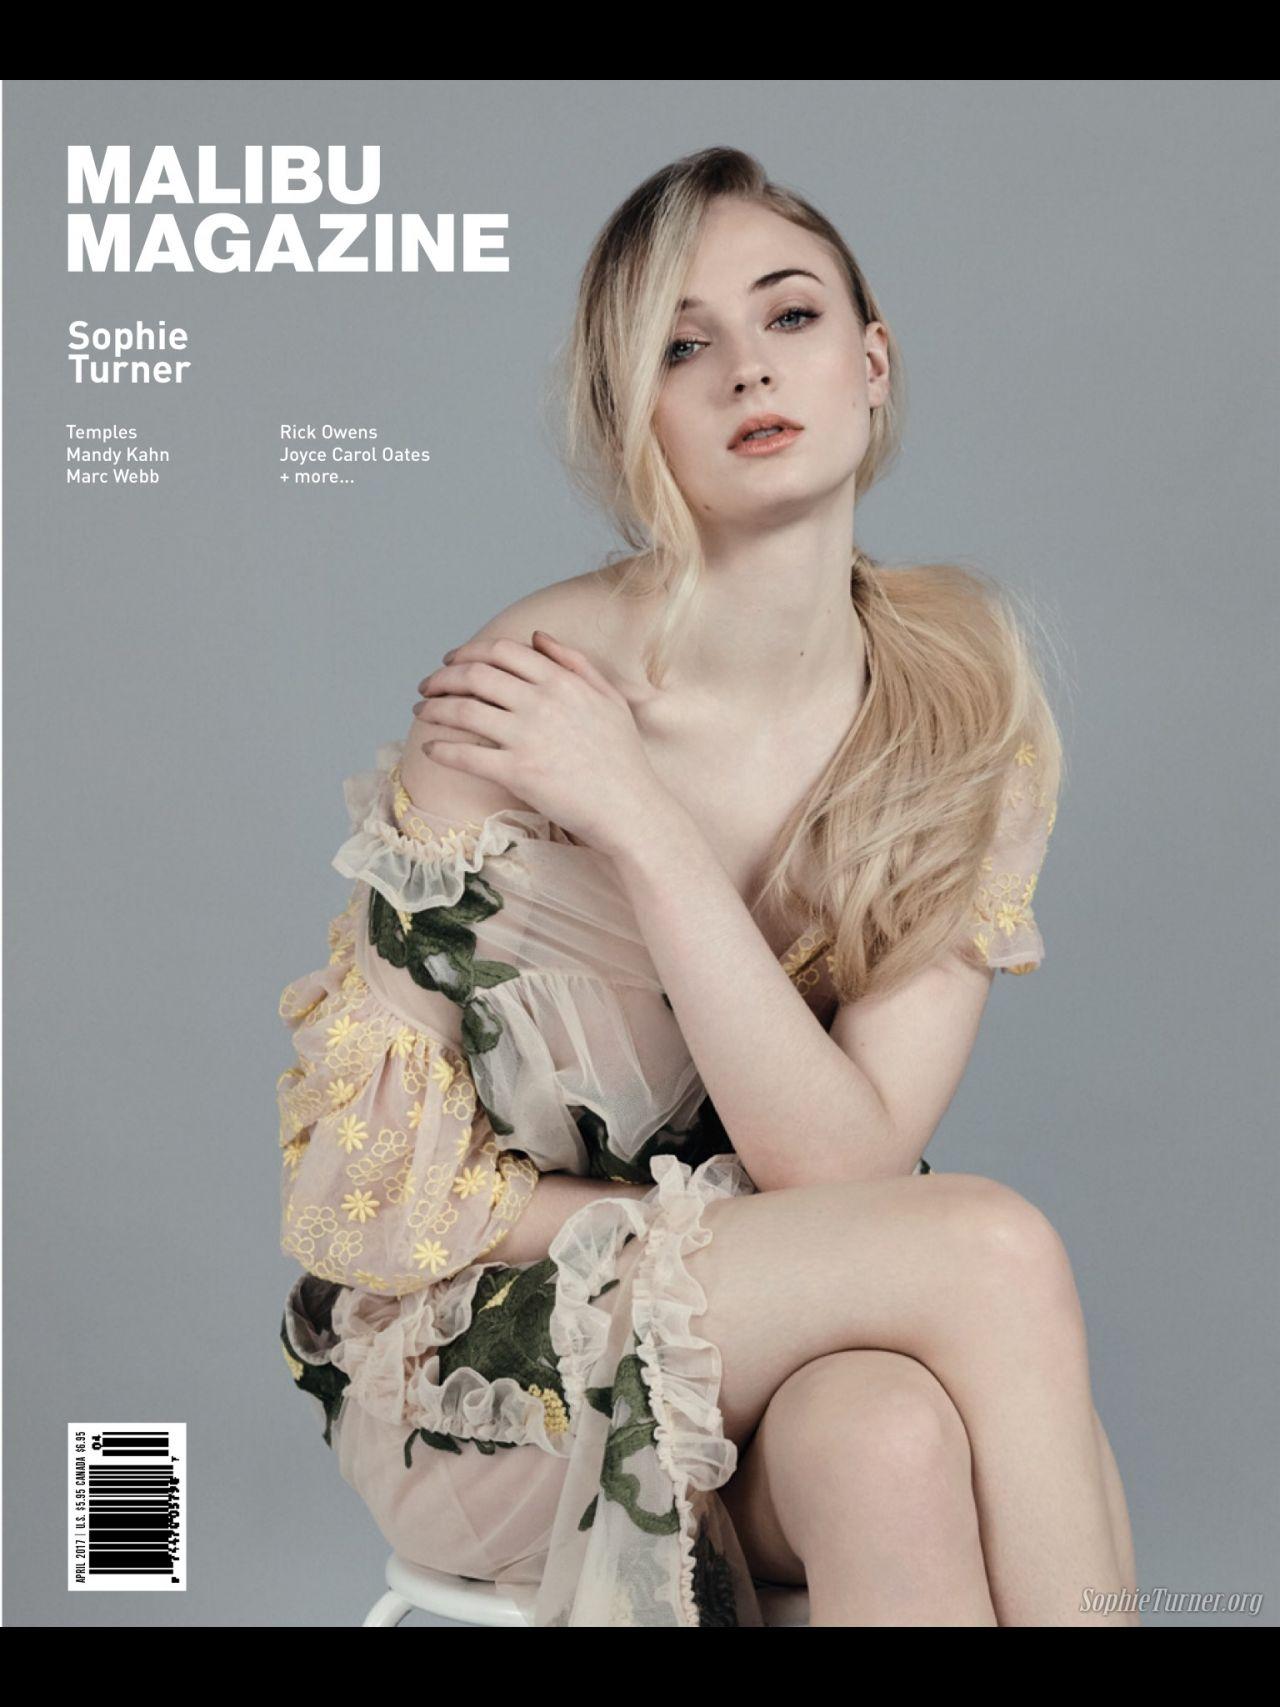 Sophie Turner Malibu Magazine April 2017 Issue